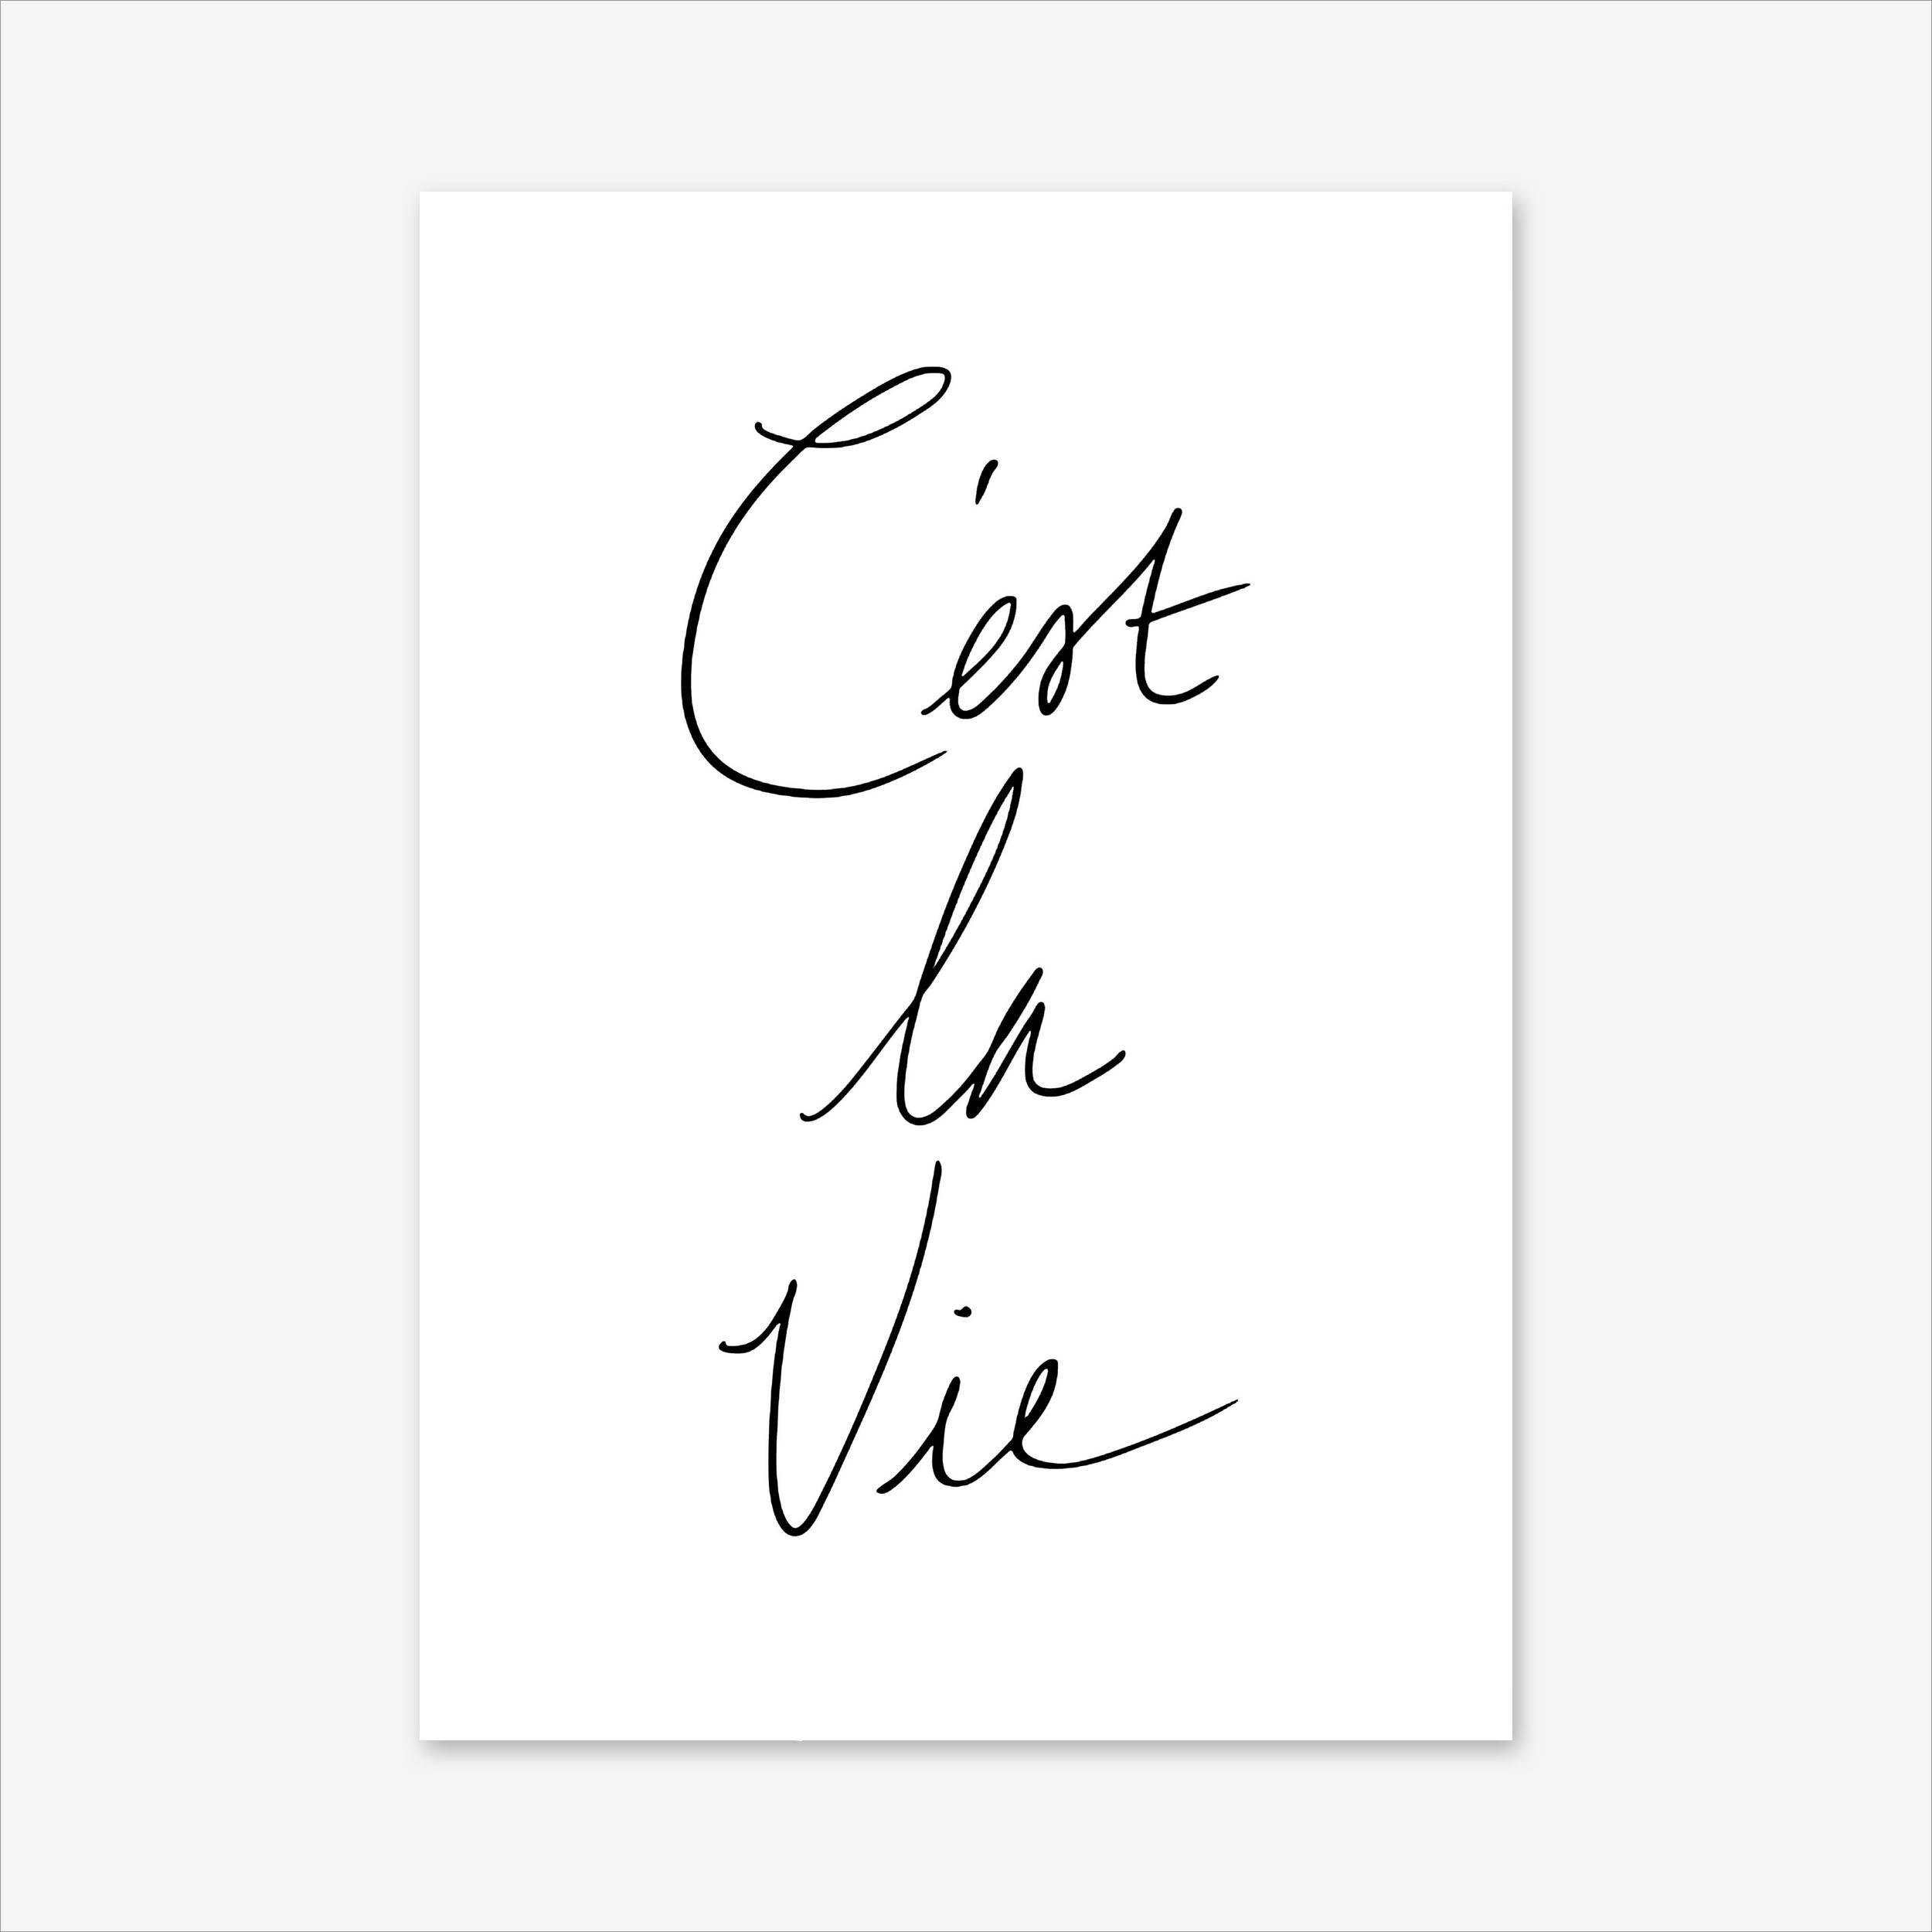 C Est La Vie Print Paris Print French Poster Typography Print French Signs Fashion Print Quote Prints Inspir Quote Prints Print Store Prints